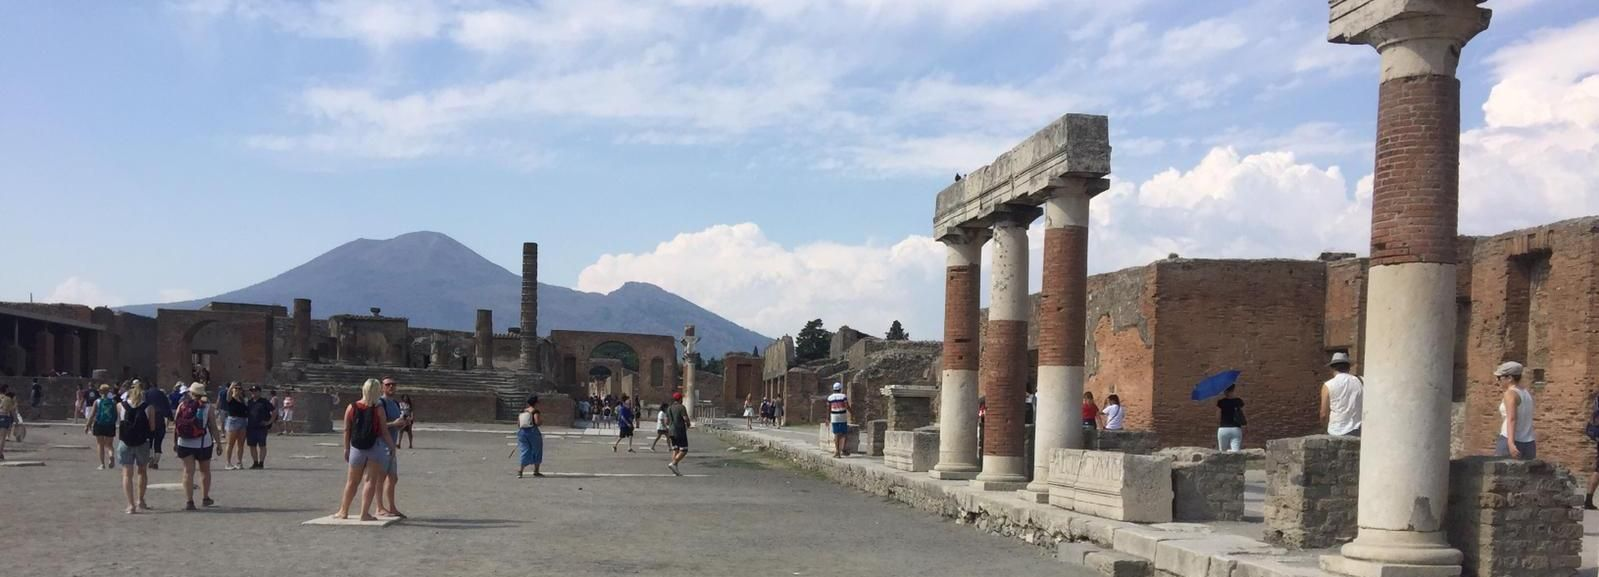 Pompeii: Transfer from Rome